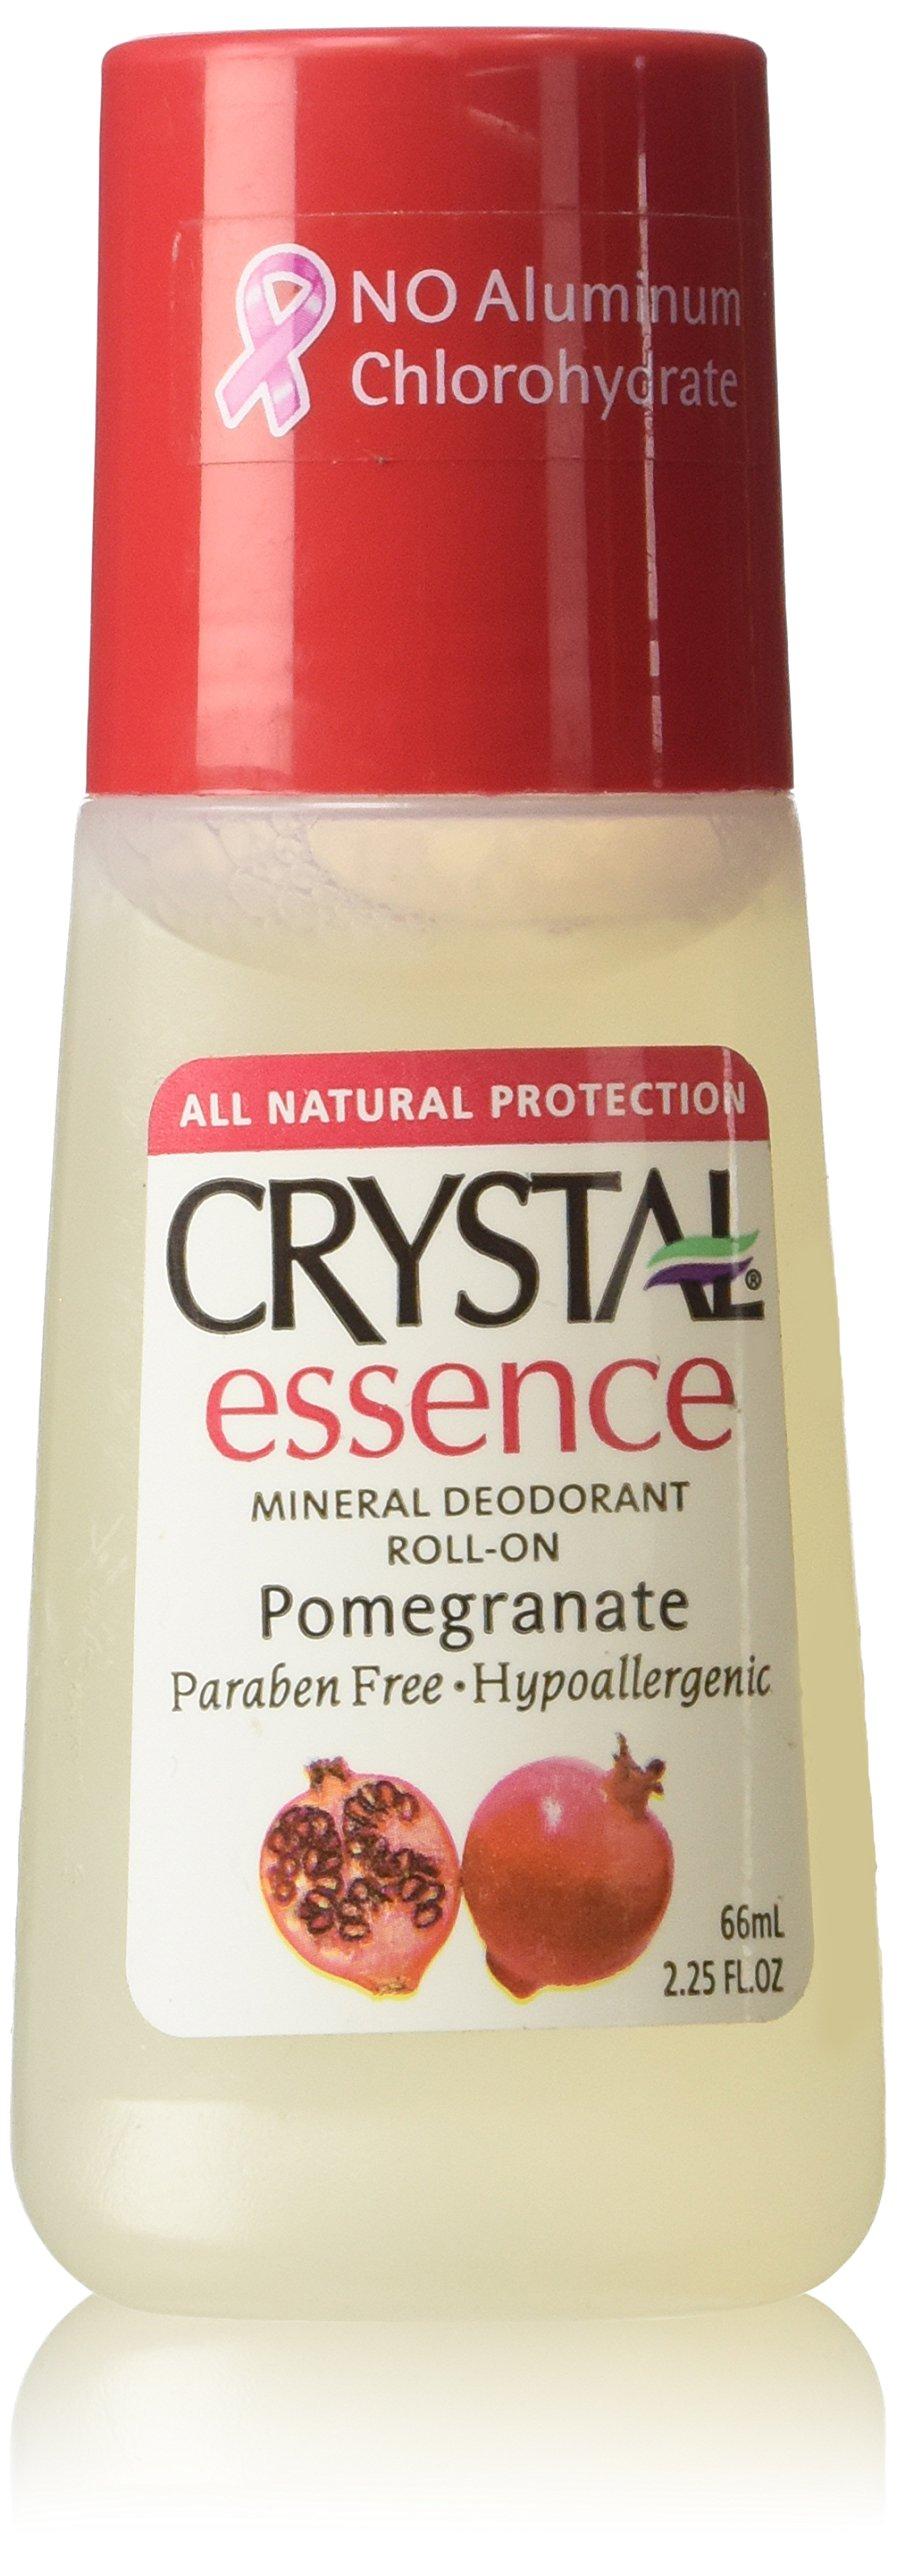 Crystal Body Deodorant Roll-On Pomegranate, 2.25 oz